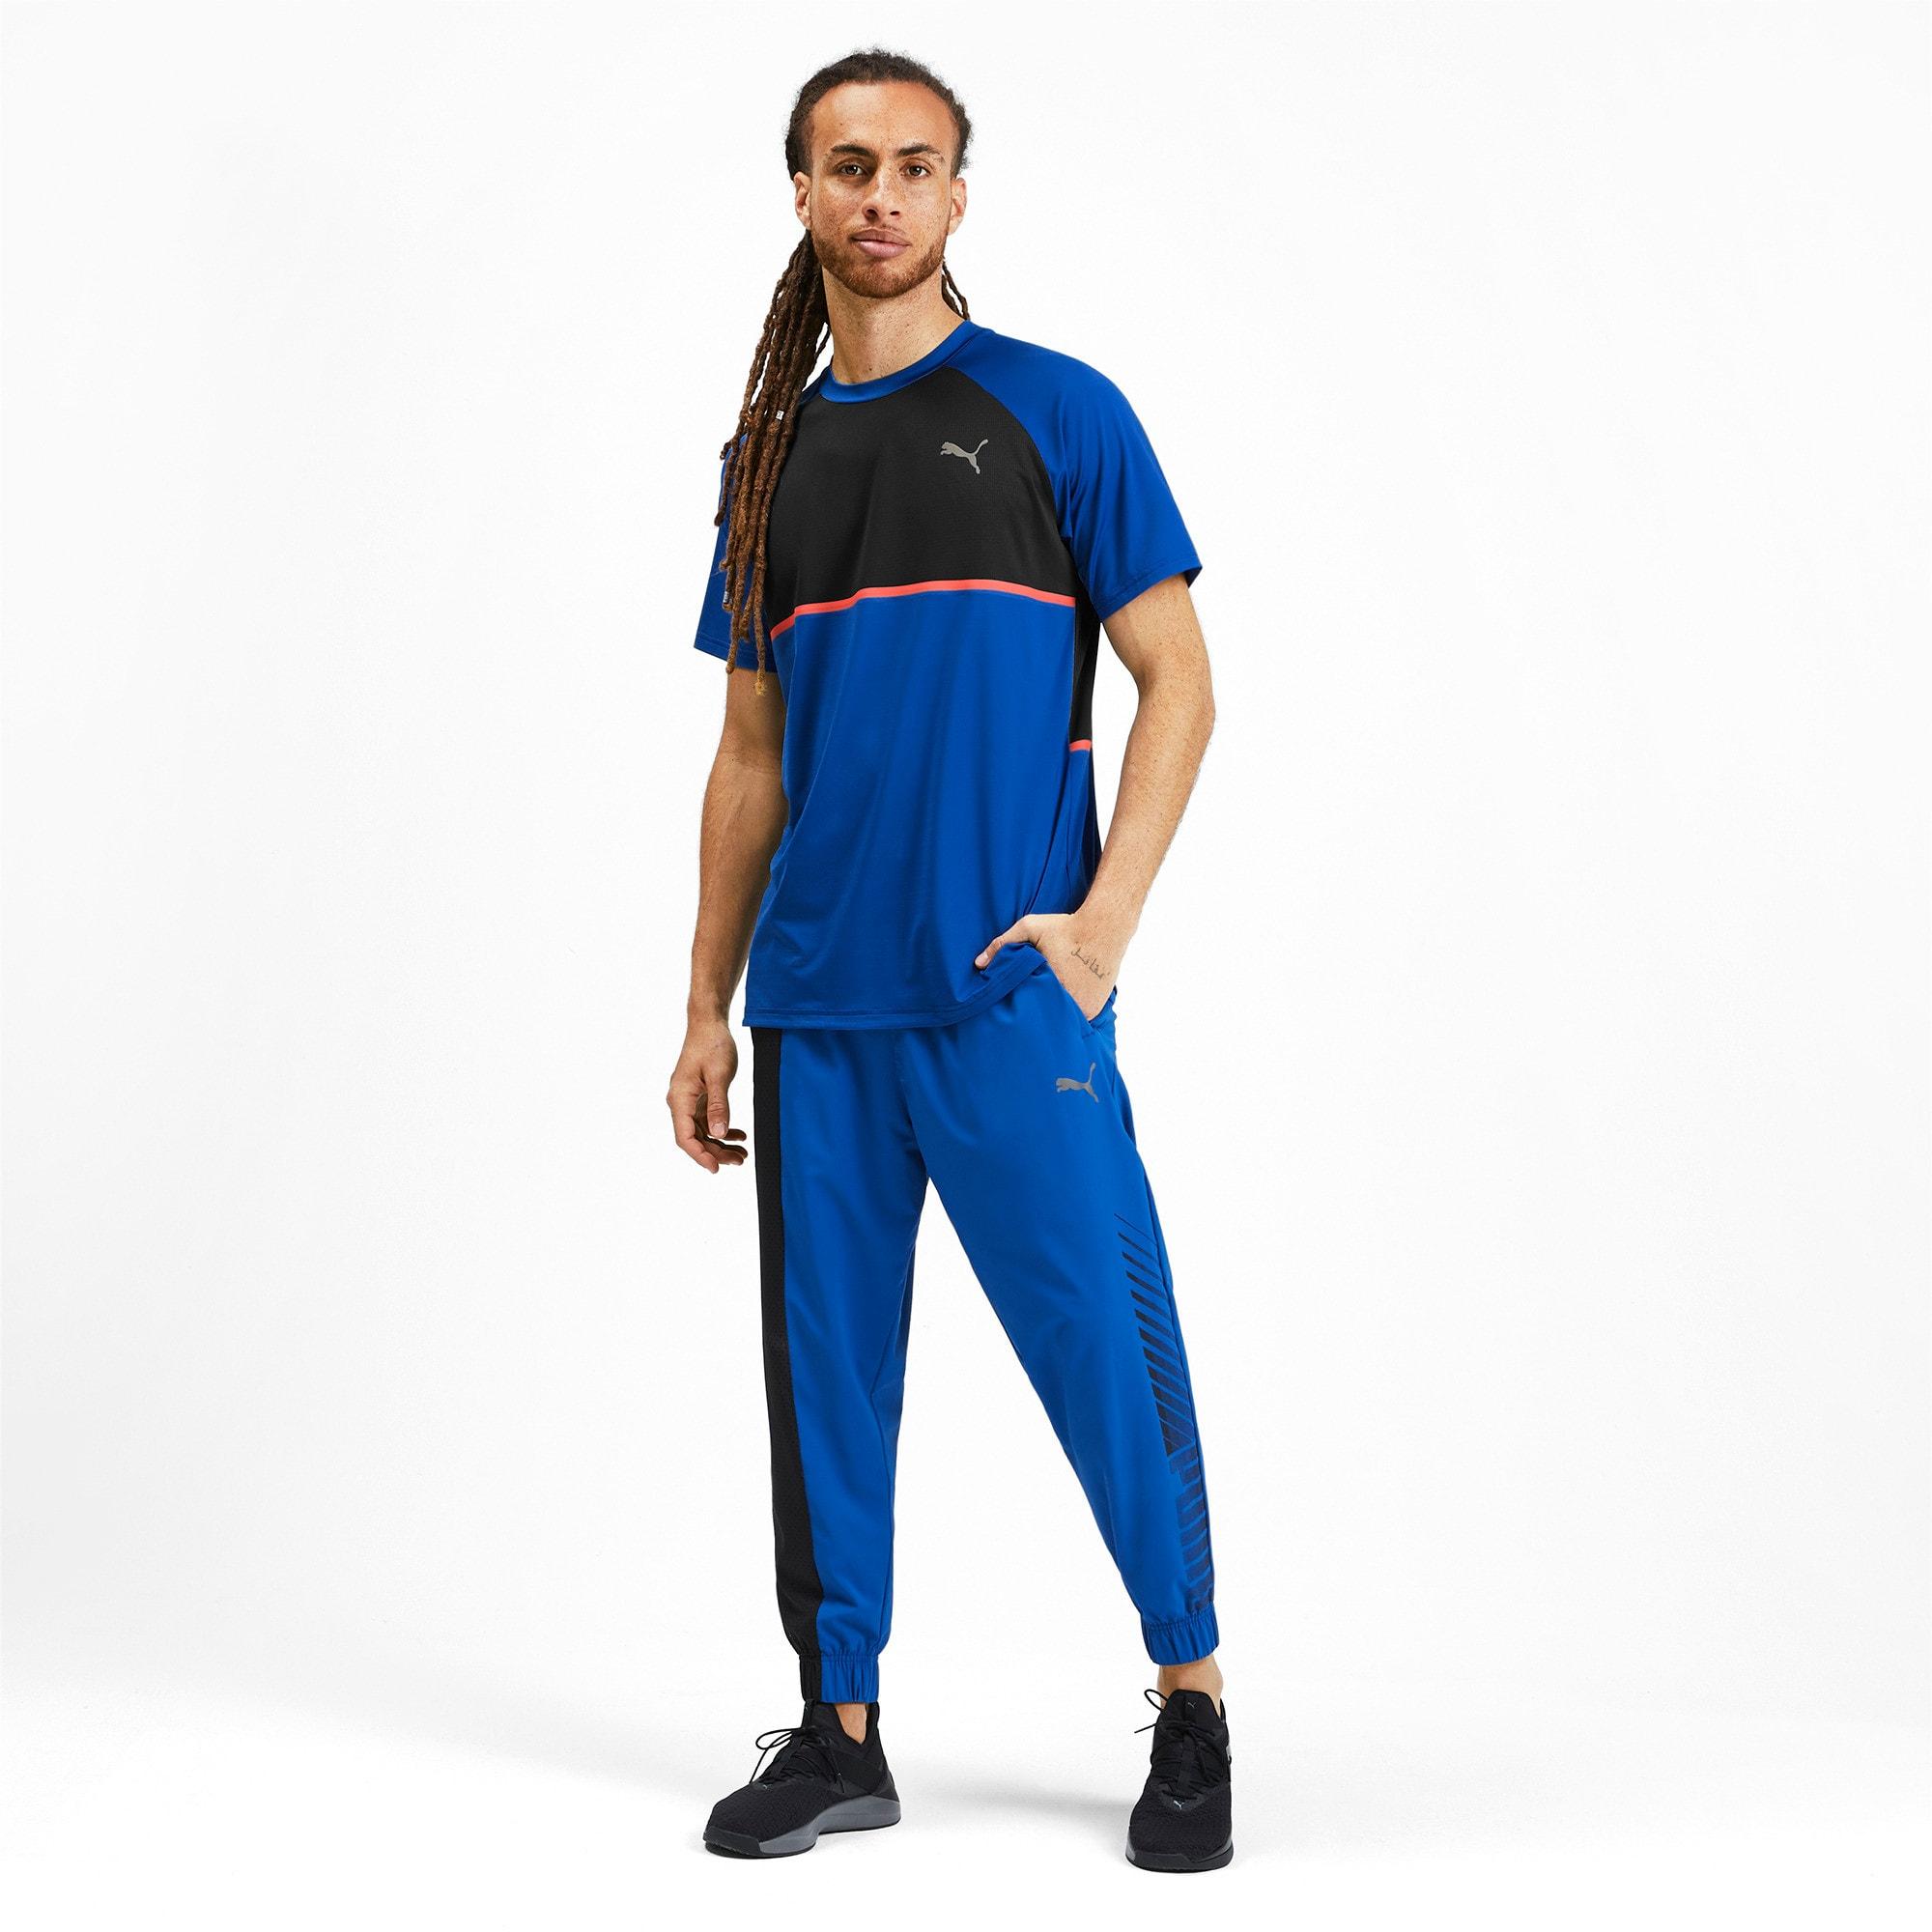 Thumbnail 3 of Power BND T-shirt voor heren, Galaxy Blue-Puma Black, medium